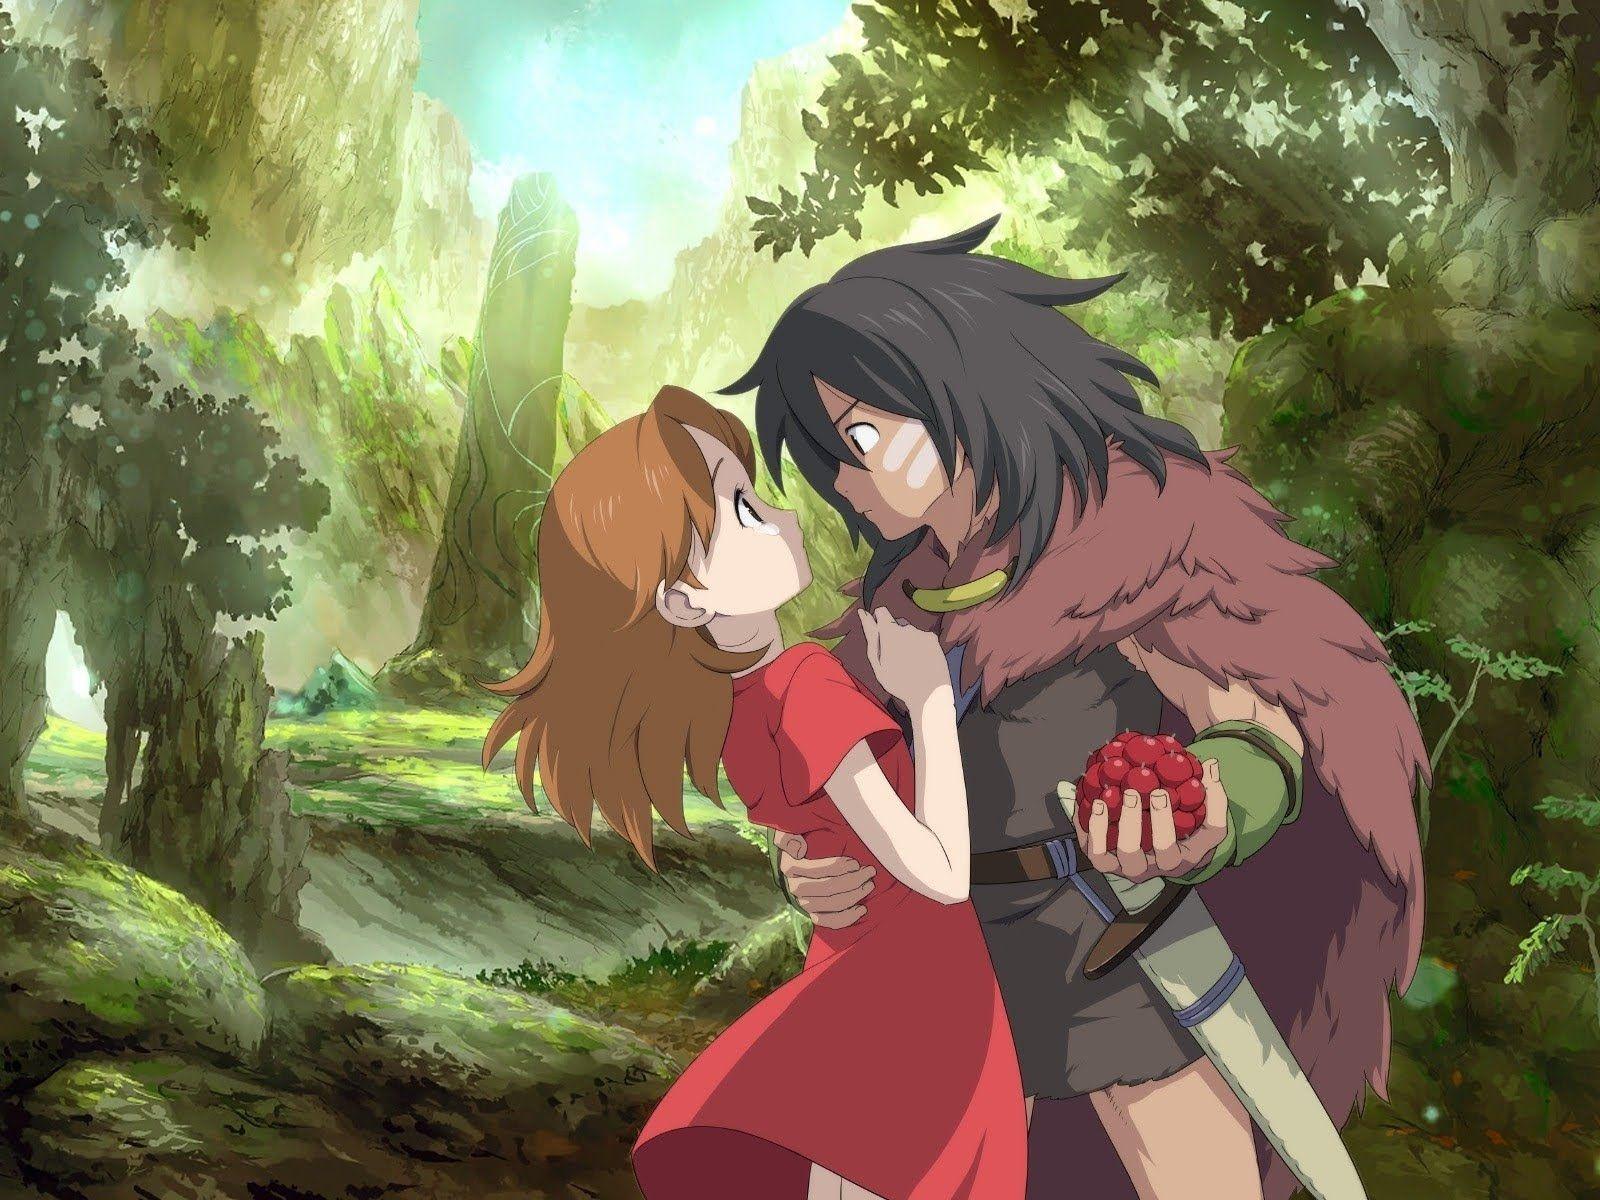 Top 10 Supernatural/Romance/Fantasy Anime [HD] Studio